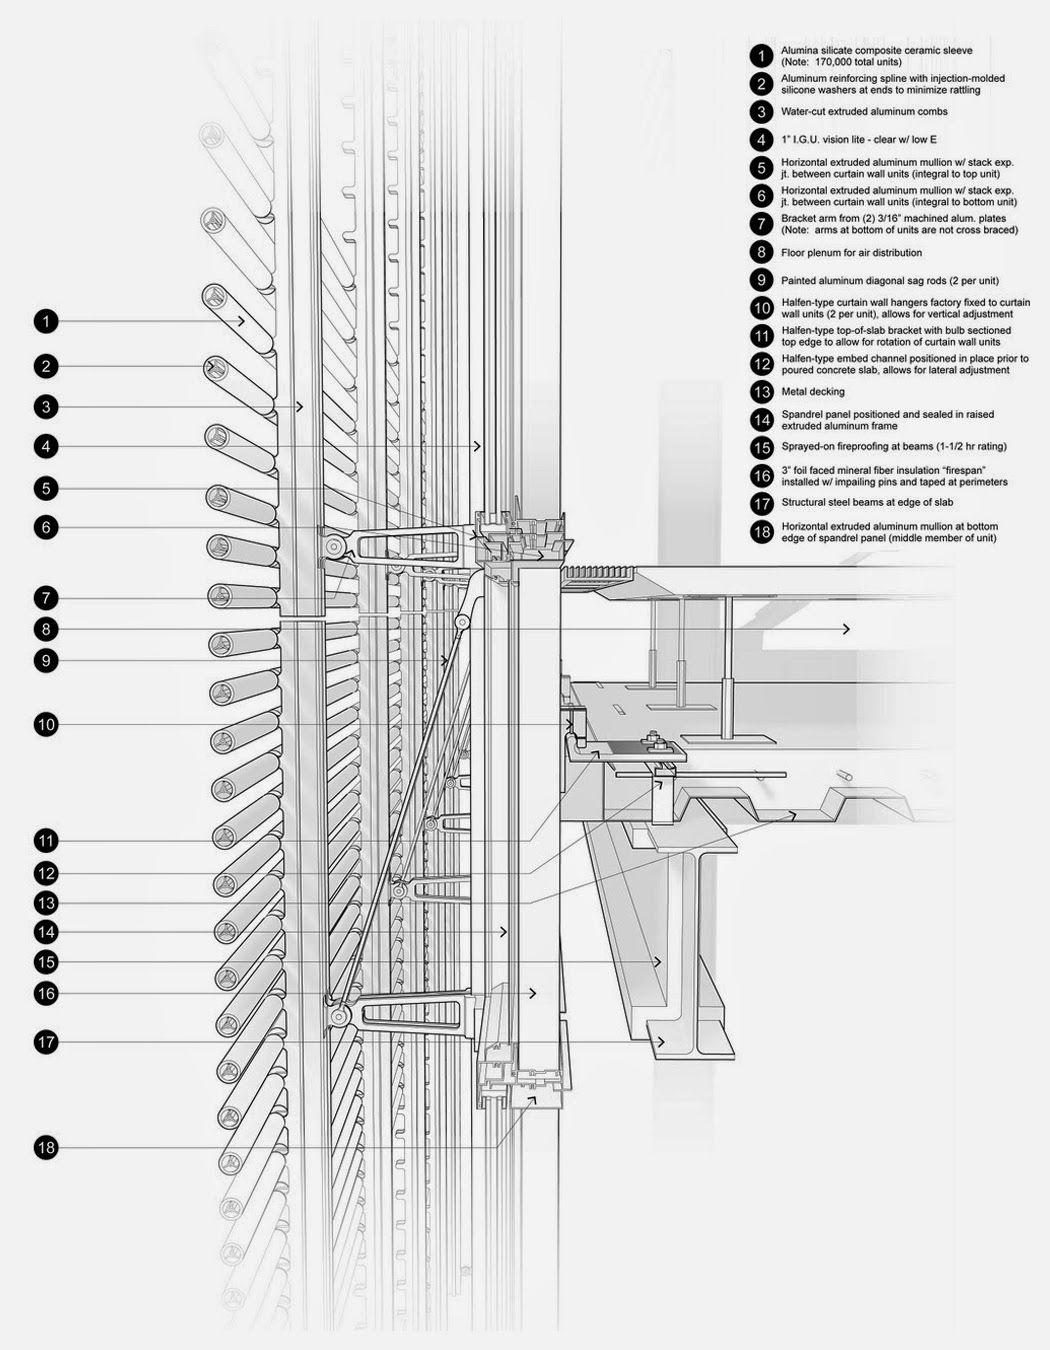 Michael H. Marsh: Architectural Technology and Design Development Work